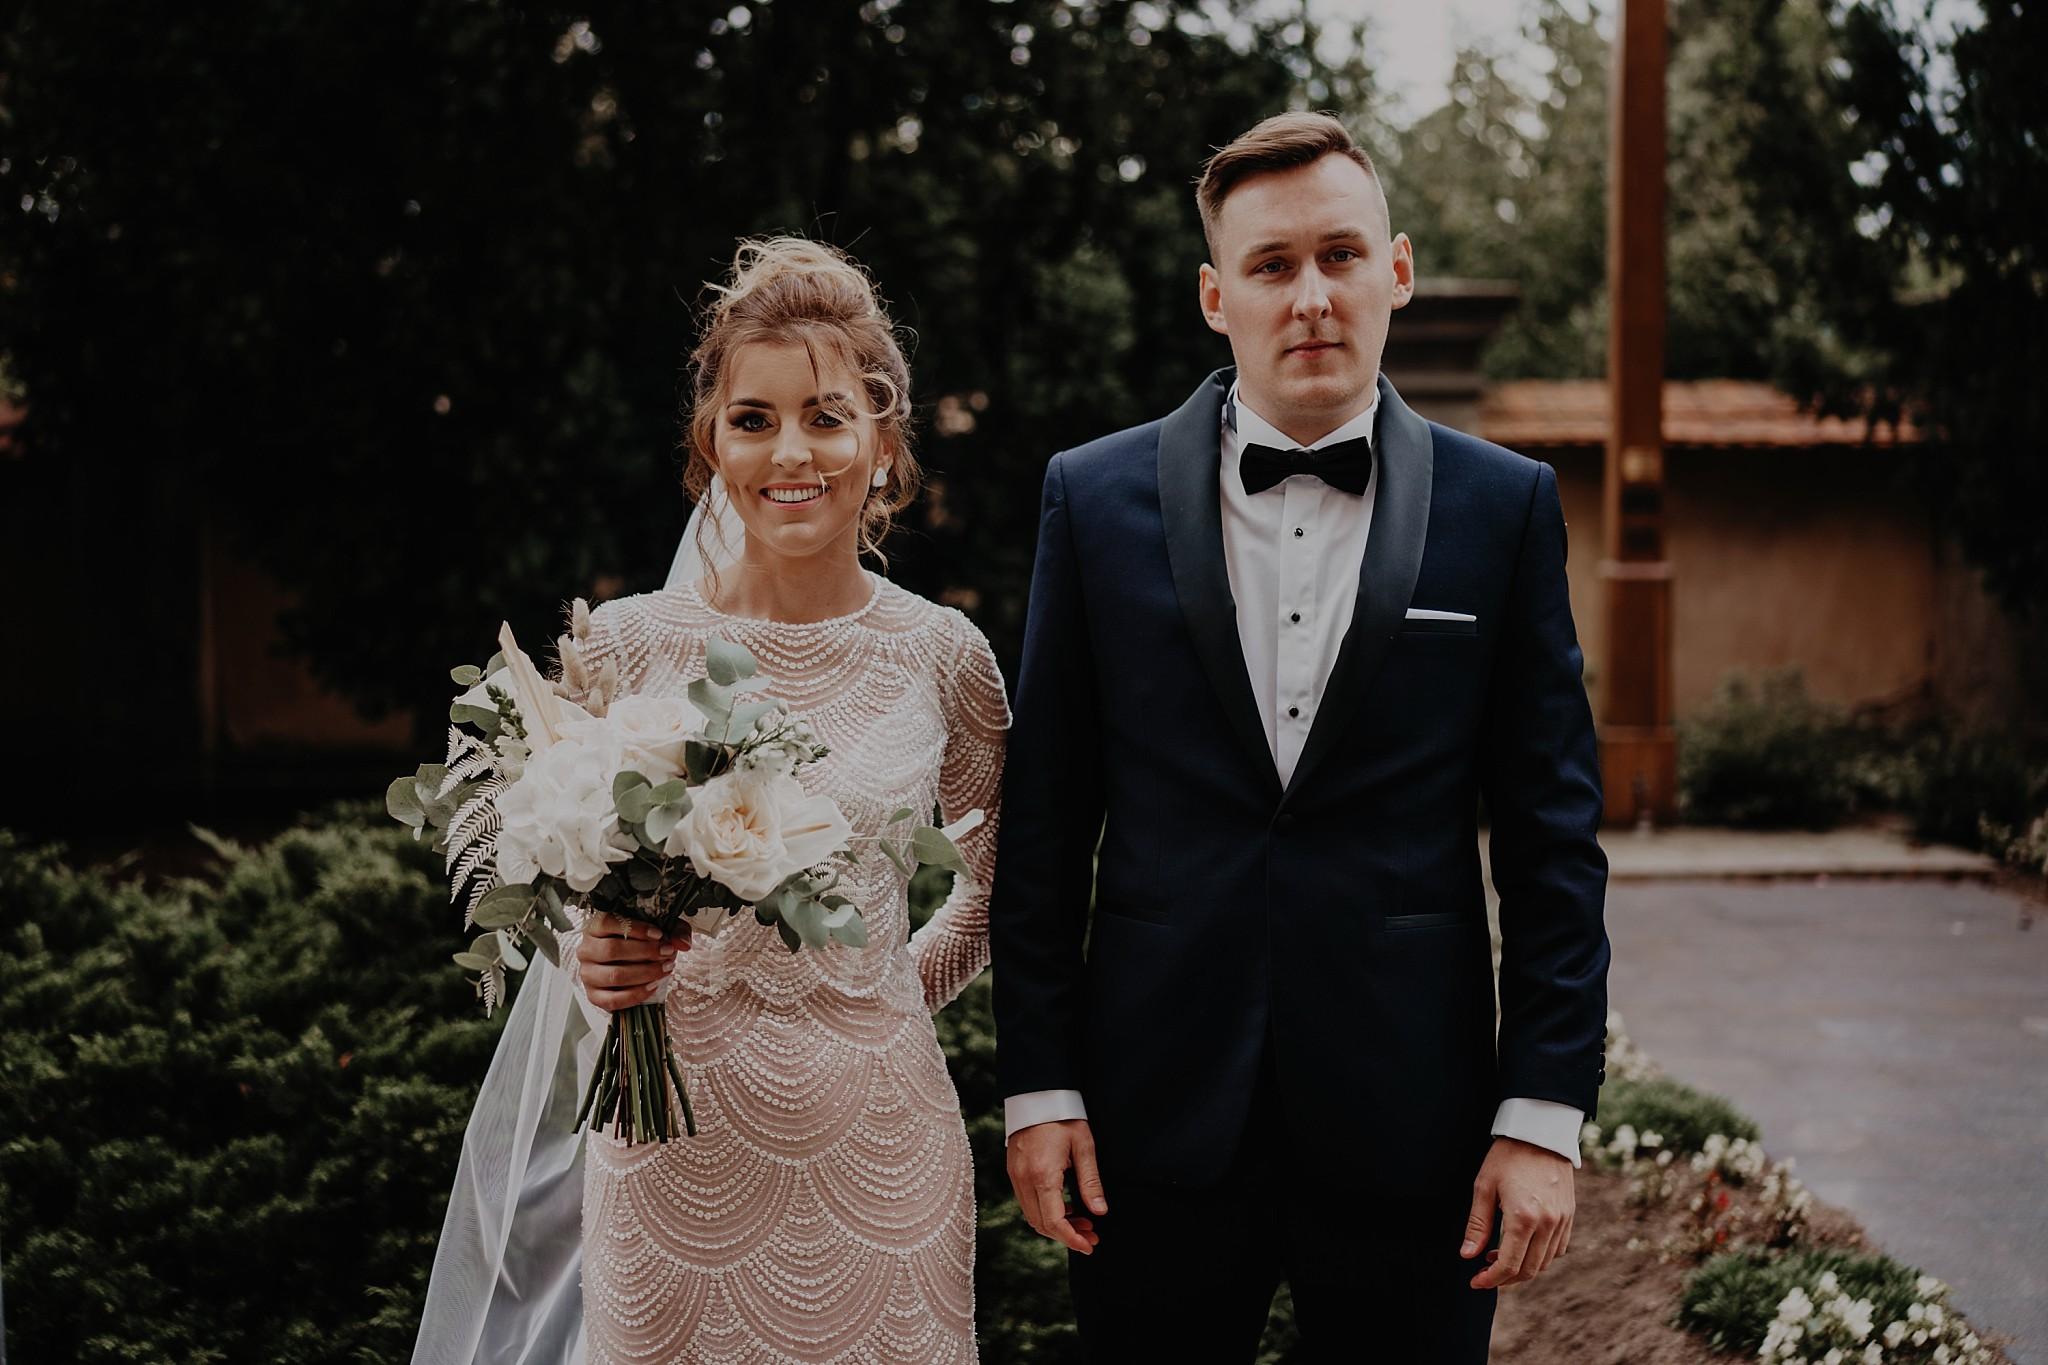 fotograf poznan wesele dobra truskawka piekne wesele pod poznaniem wesele w dobrej truskawce piekna para mloda slub marzen slub koronawirus slub listopad wesele koronawirus 128